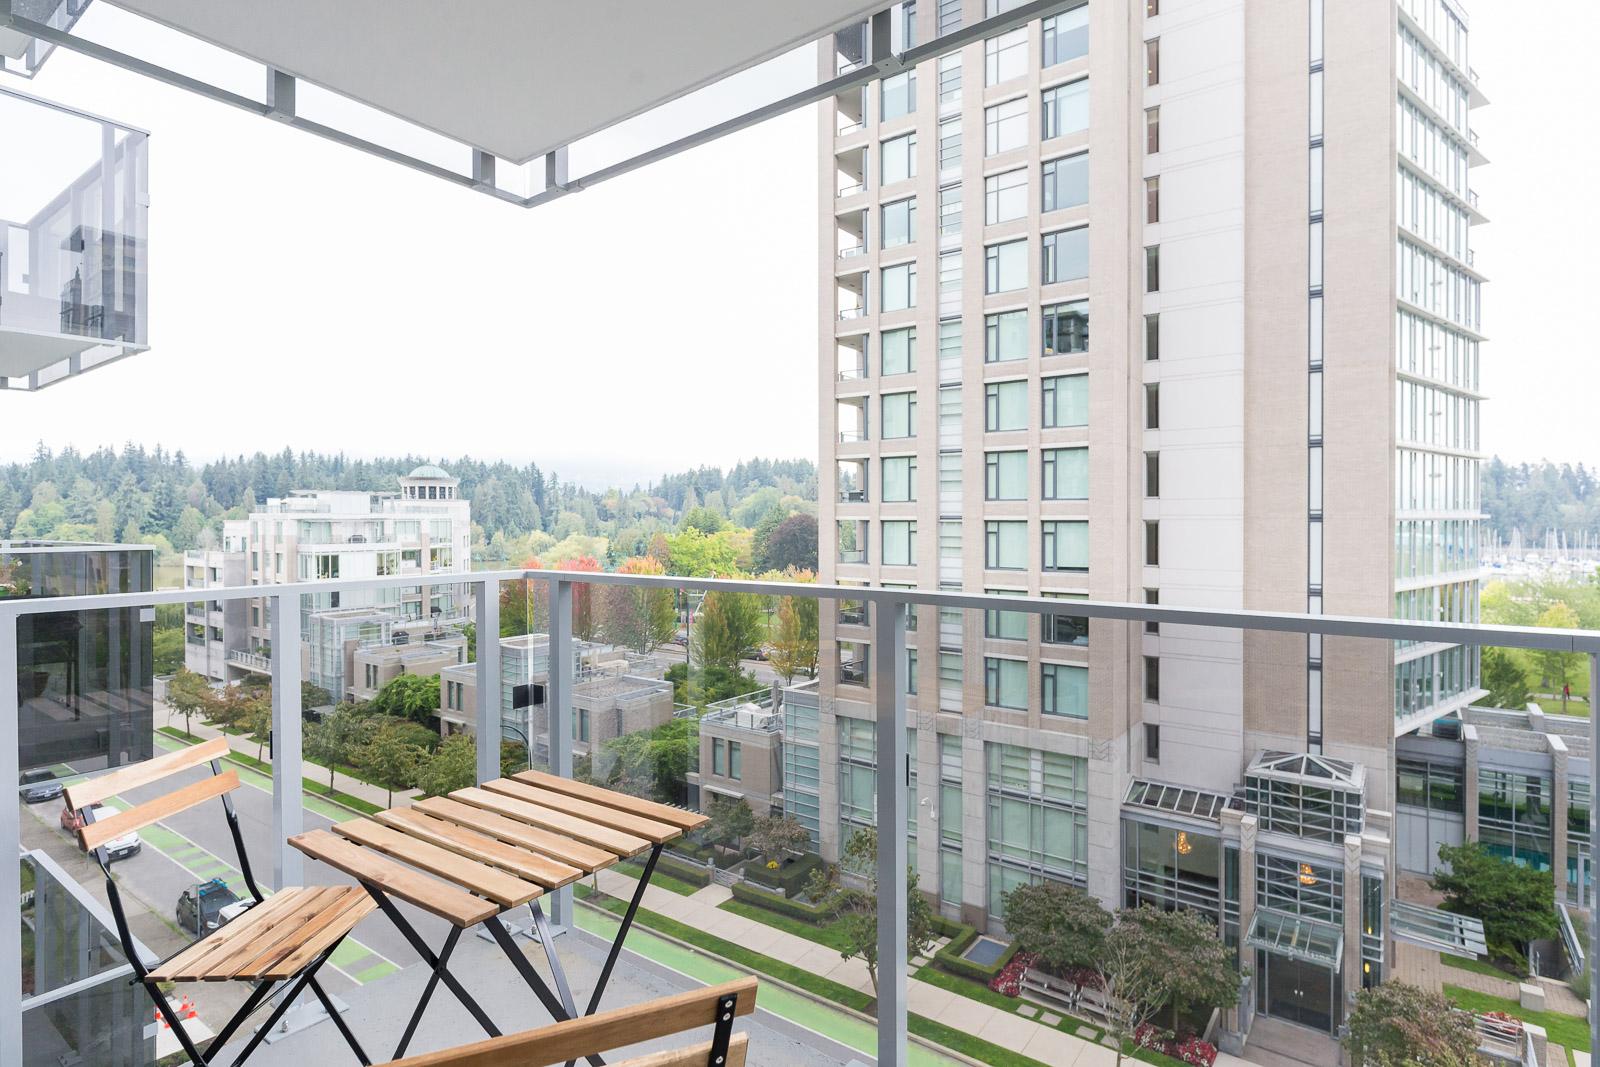 Hollyburn Harbourview 1Bedroom Furnished Rental balcony 604